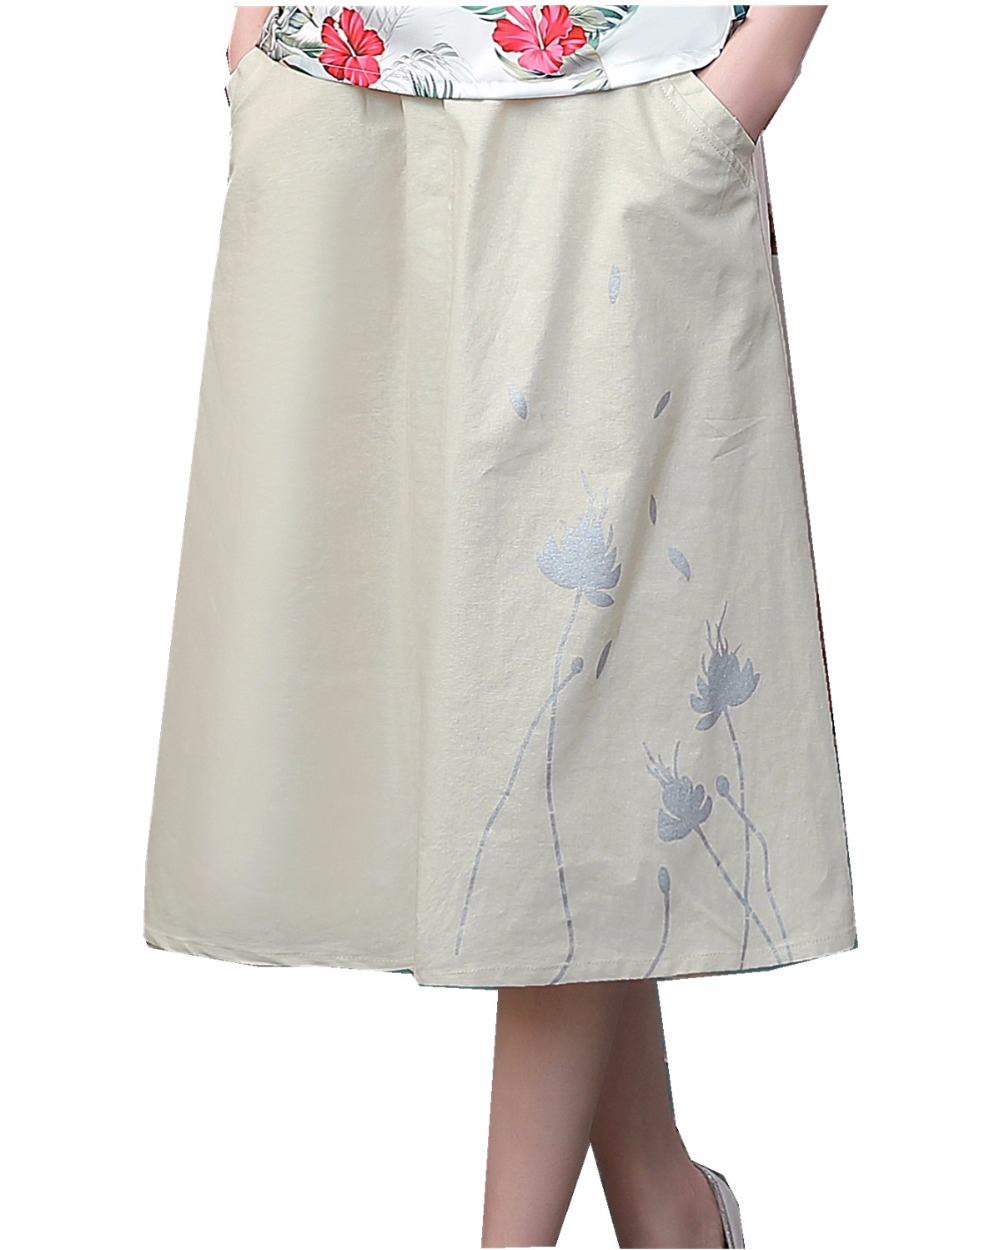 free shipping linen skirt summer skirts